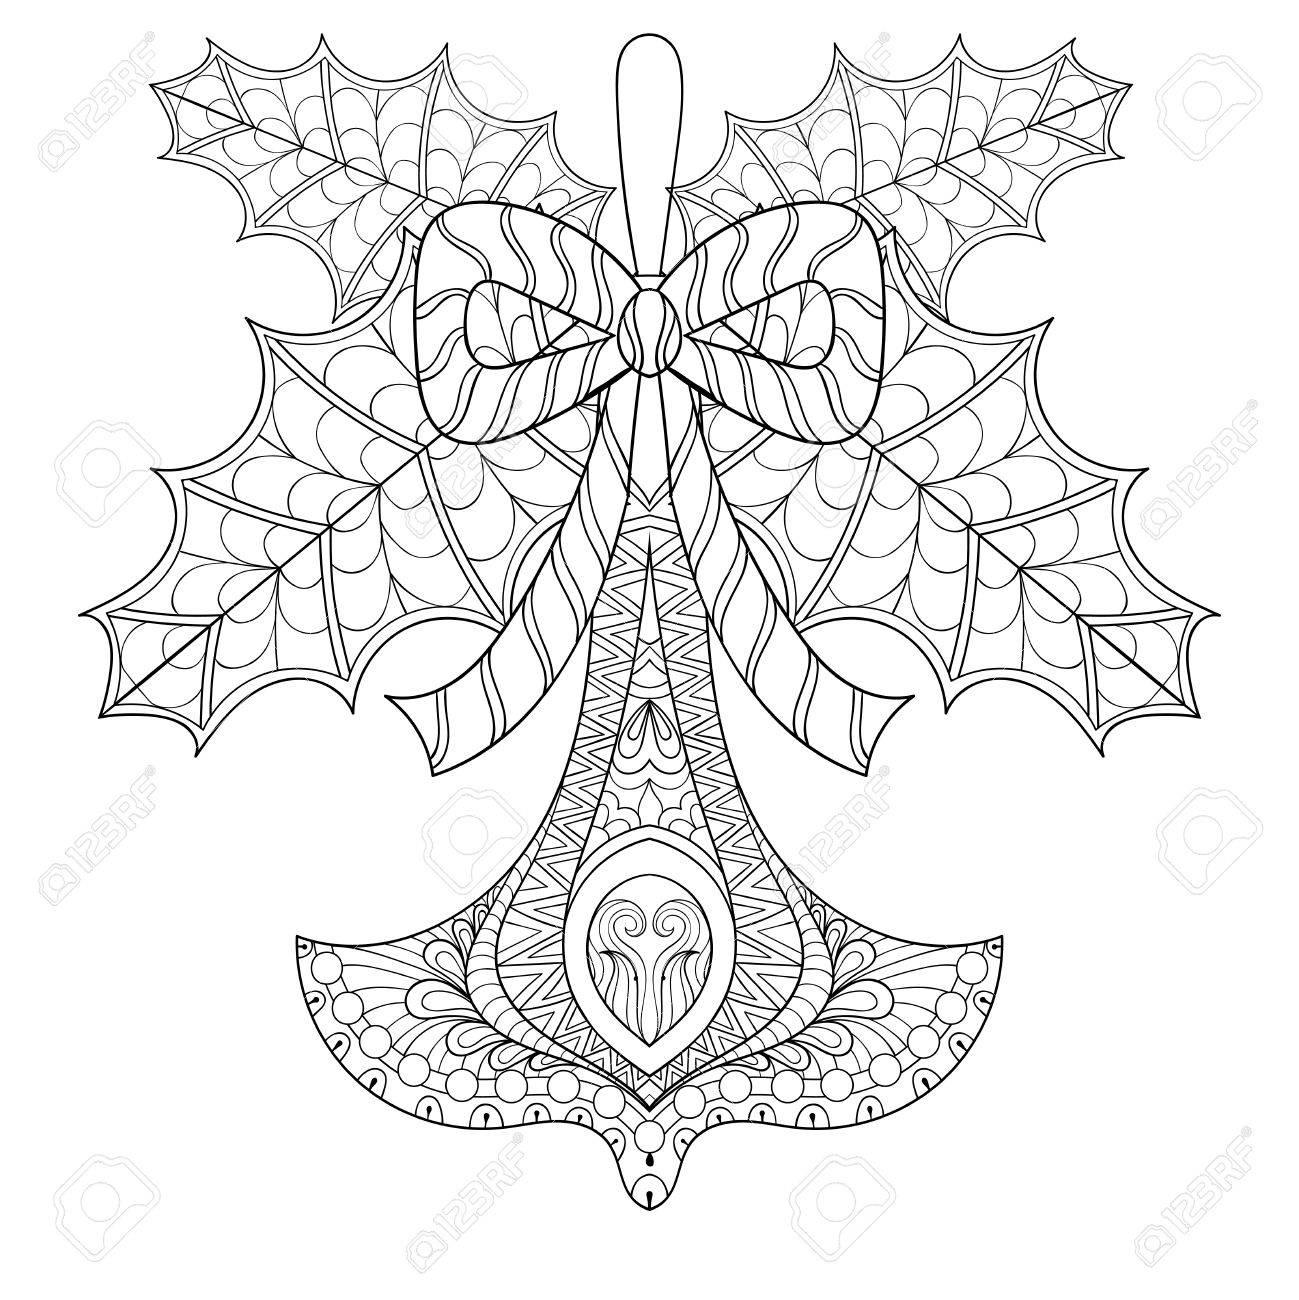 1299x1300 Christmas Mistletoe Drawing. Mistletoe Detailed. Free Printable